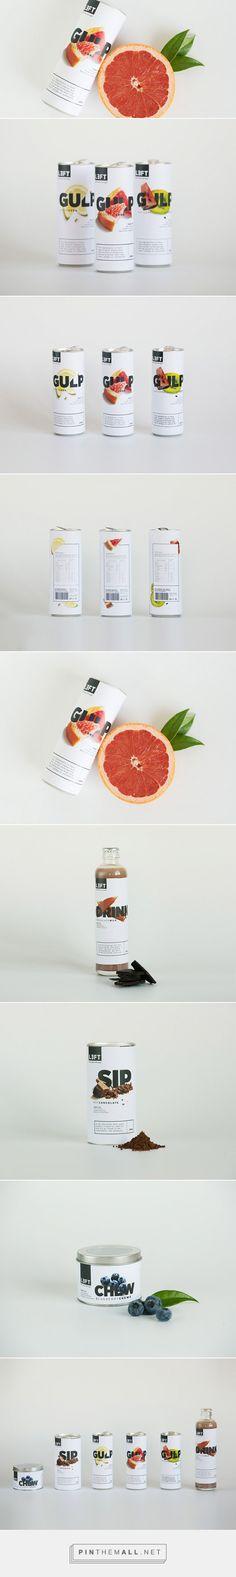 LEFT -  Package design & identity for a nutritional brand by Kirsten Bennett, Marguerite Nel